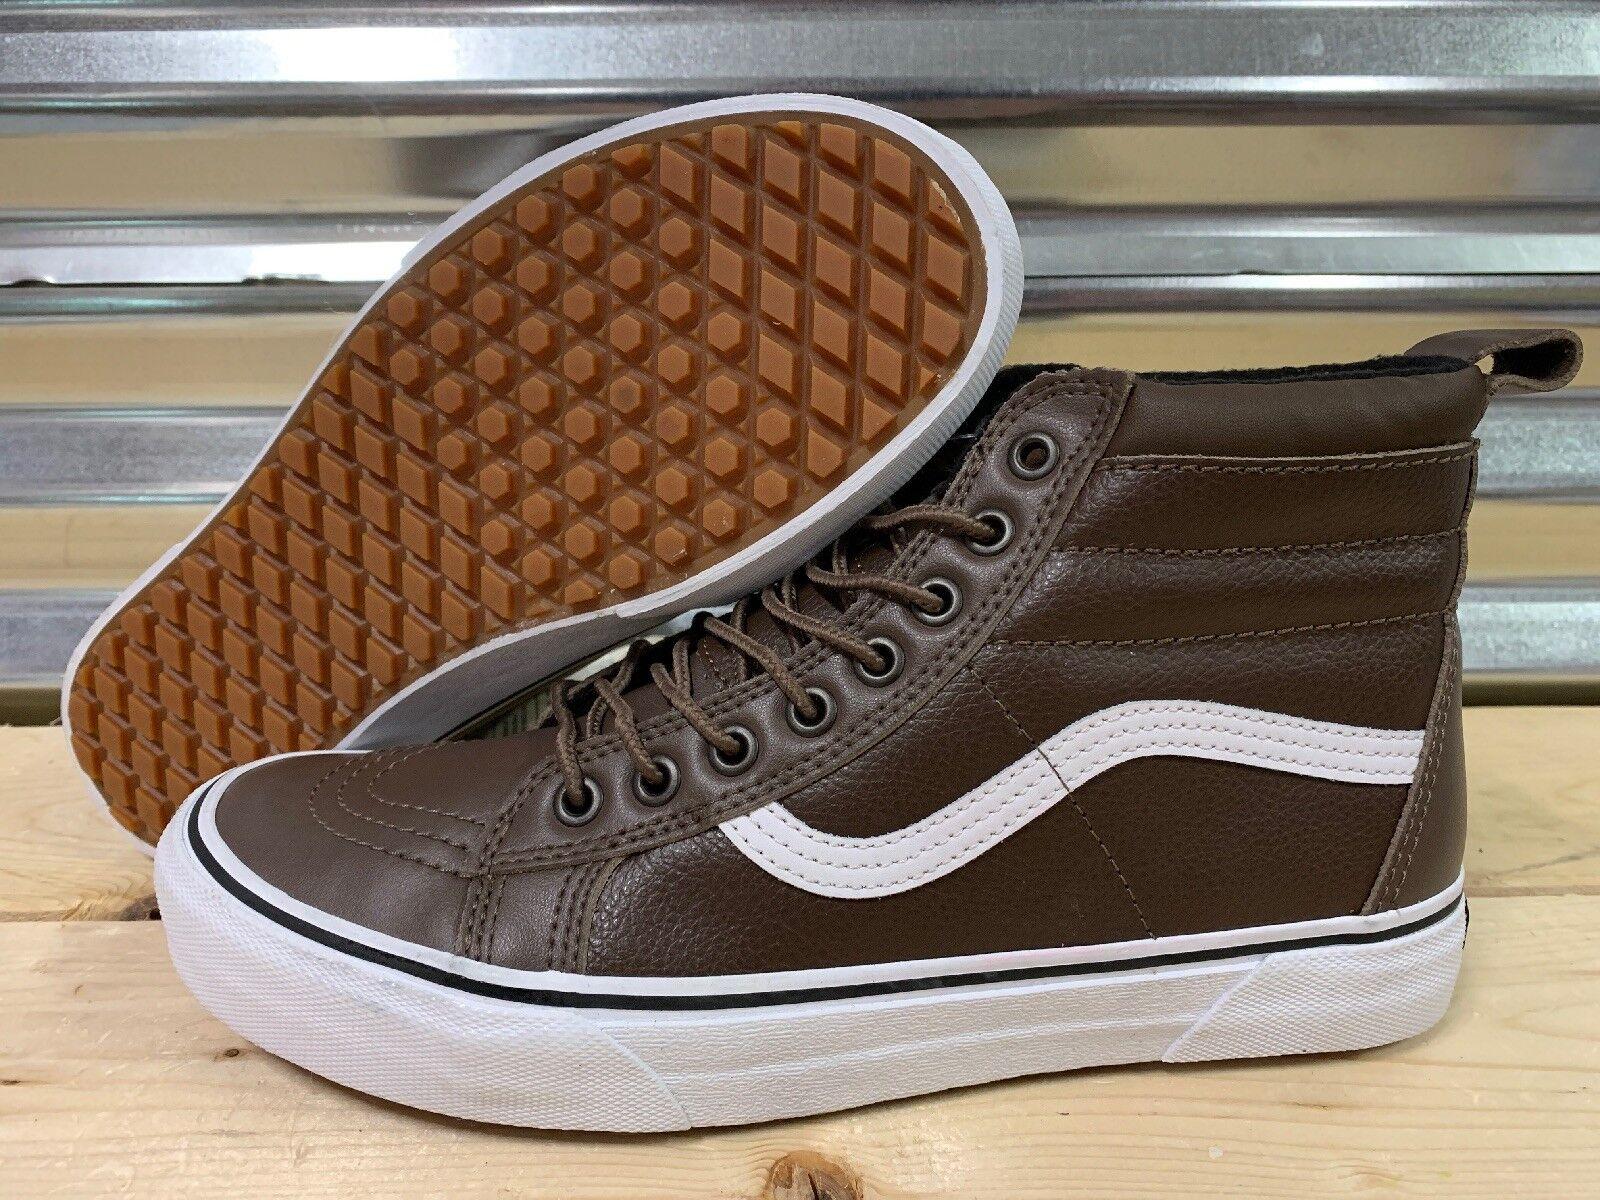 Vans Sk8 Hi MTE Warm Lining SB shoes Rain Drum Brown Leather SZ 9 (VN0A33TXUQC)